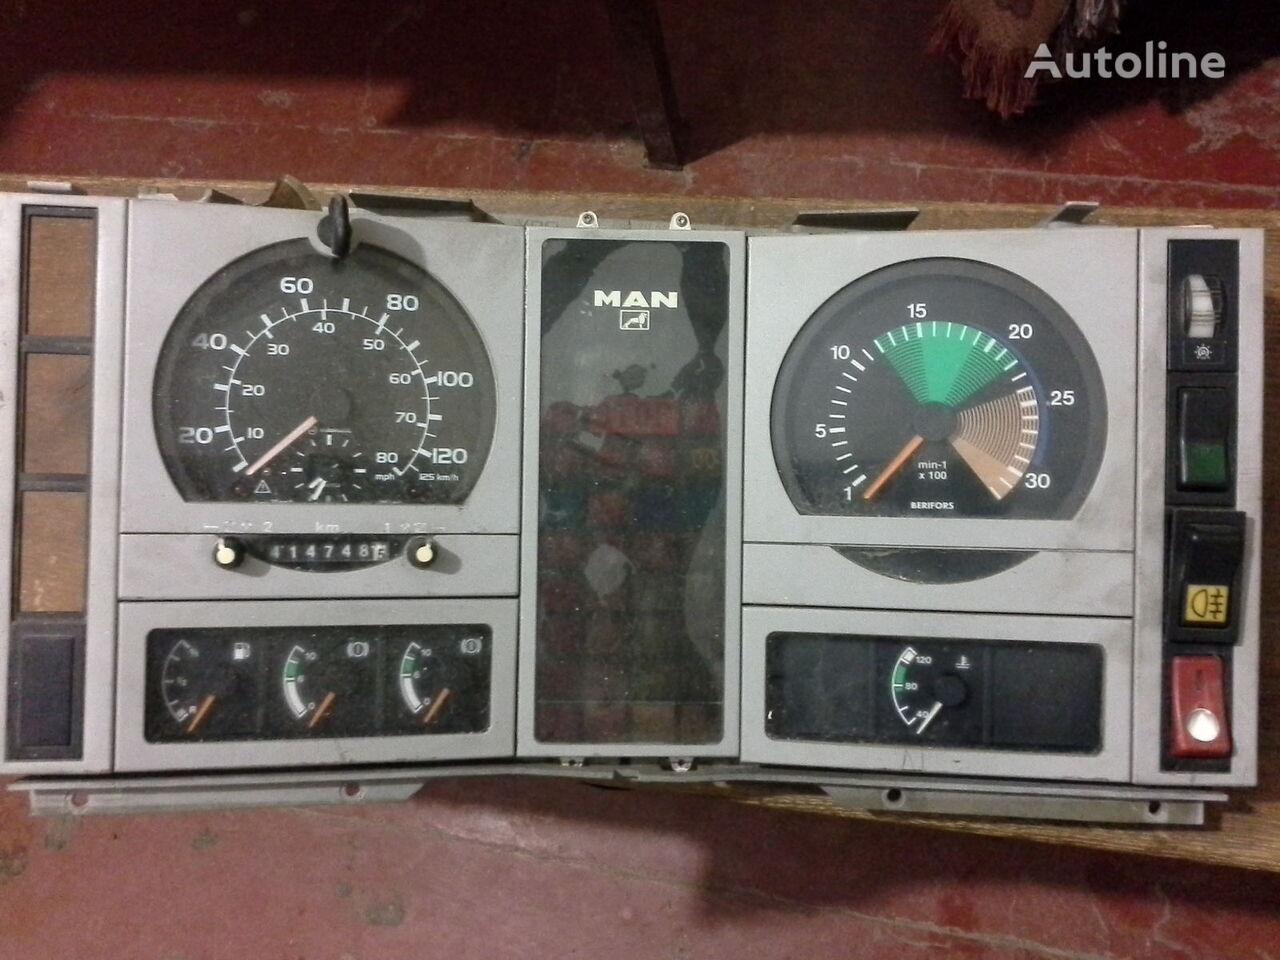 MAN Spidometr Tahometr originalni zapchasti kabini tacógrafo para MAN  L2000 Po zapchastyam camião